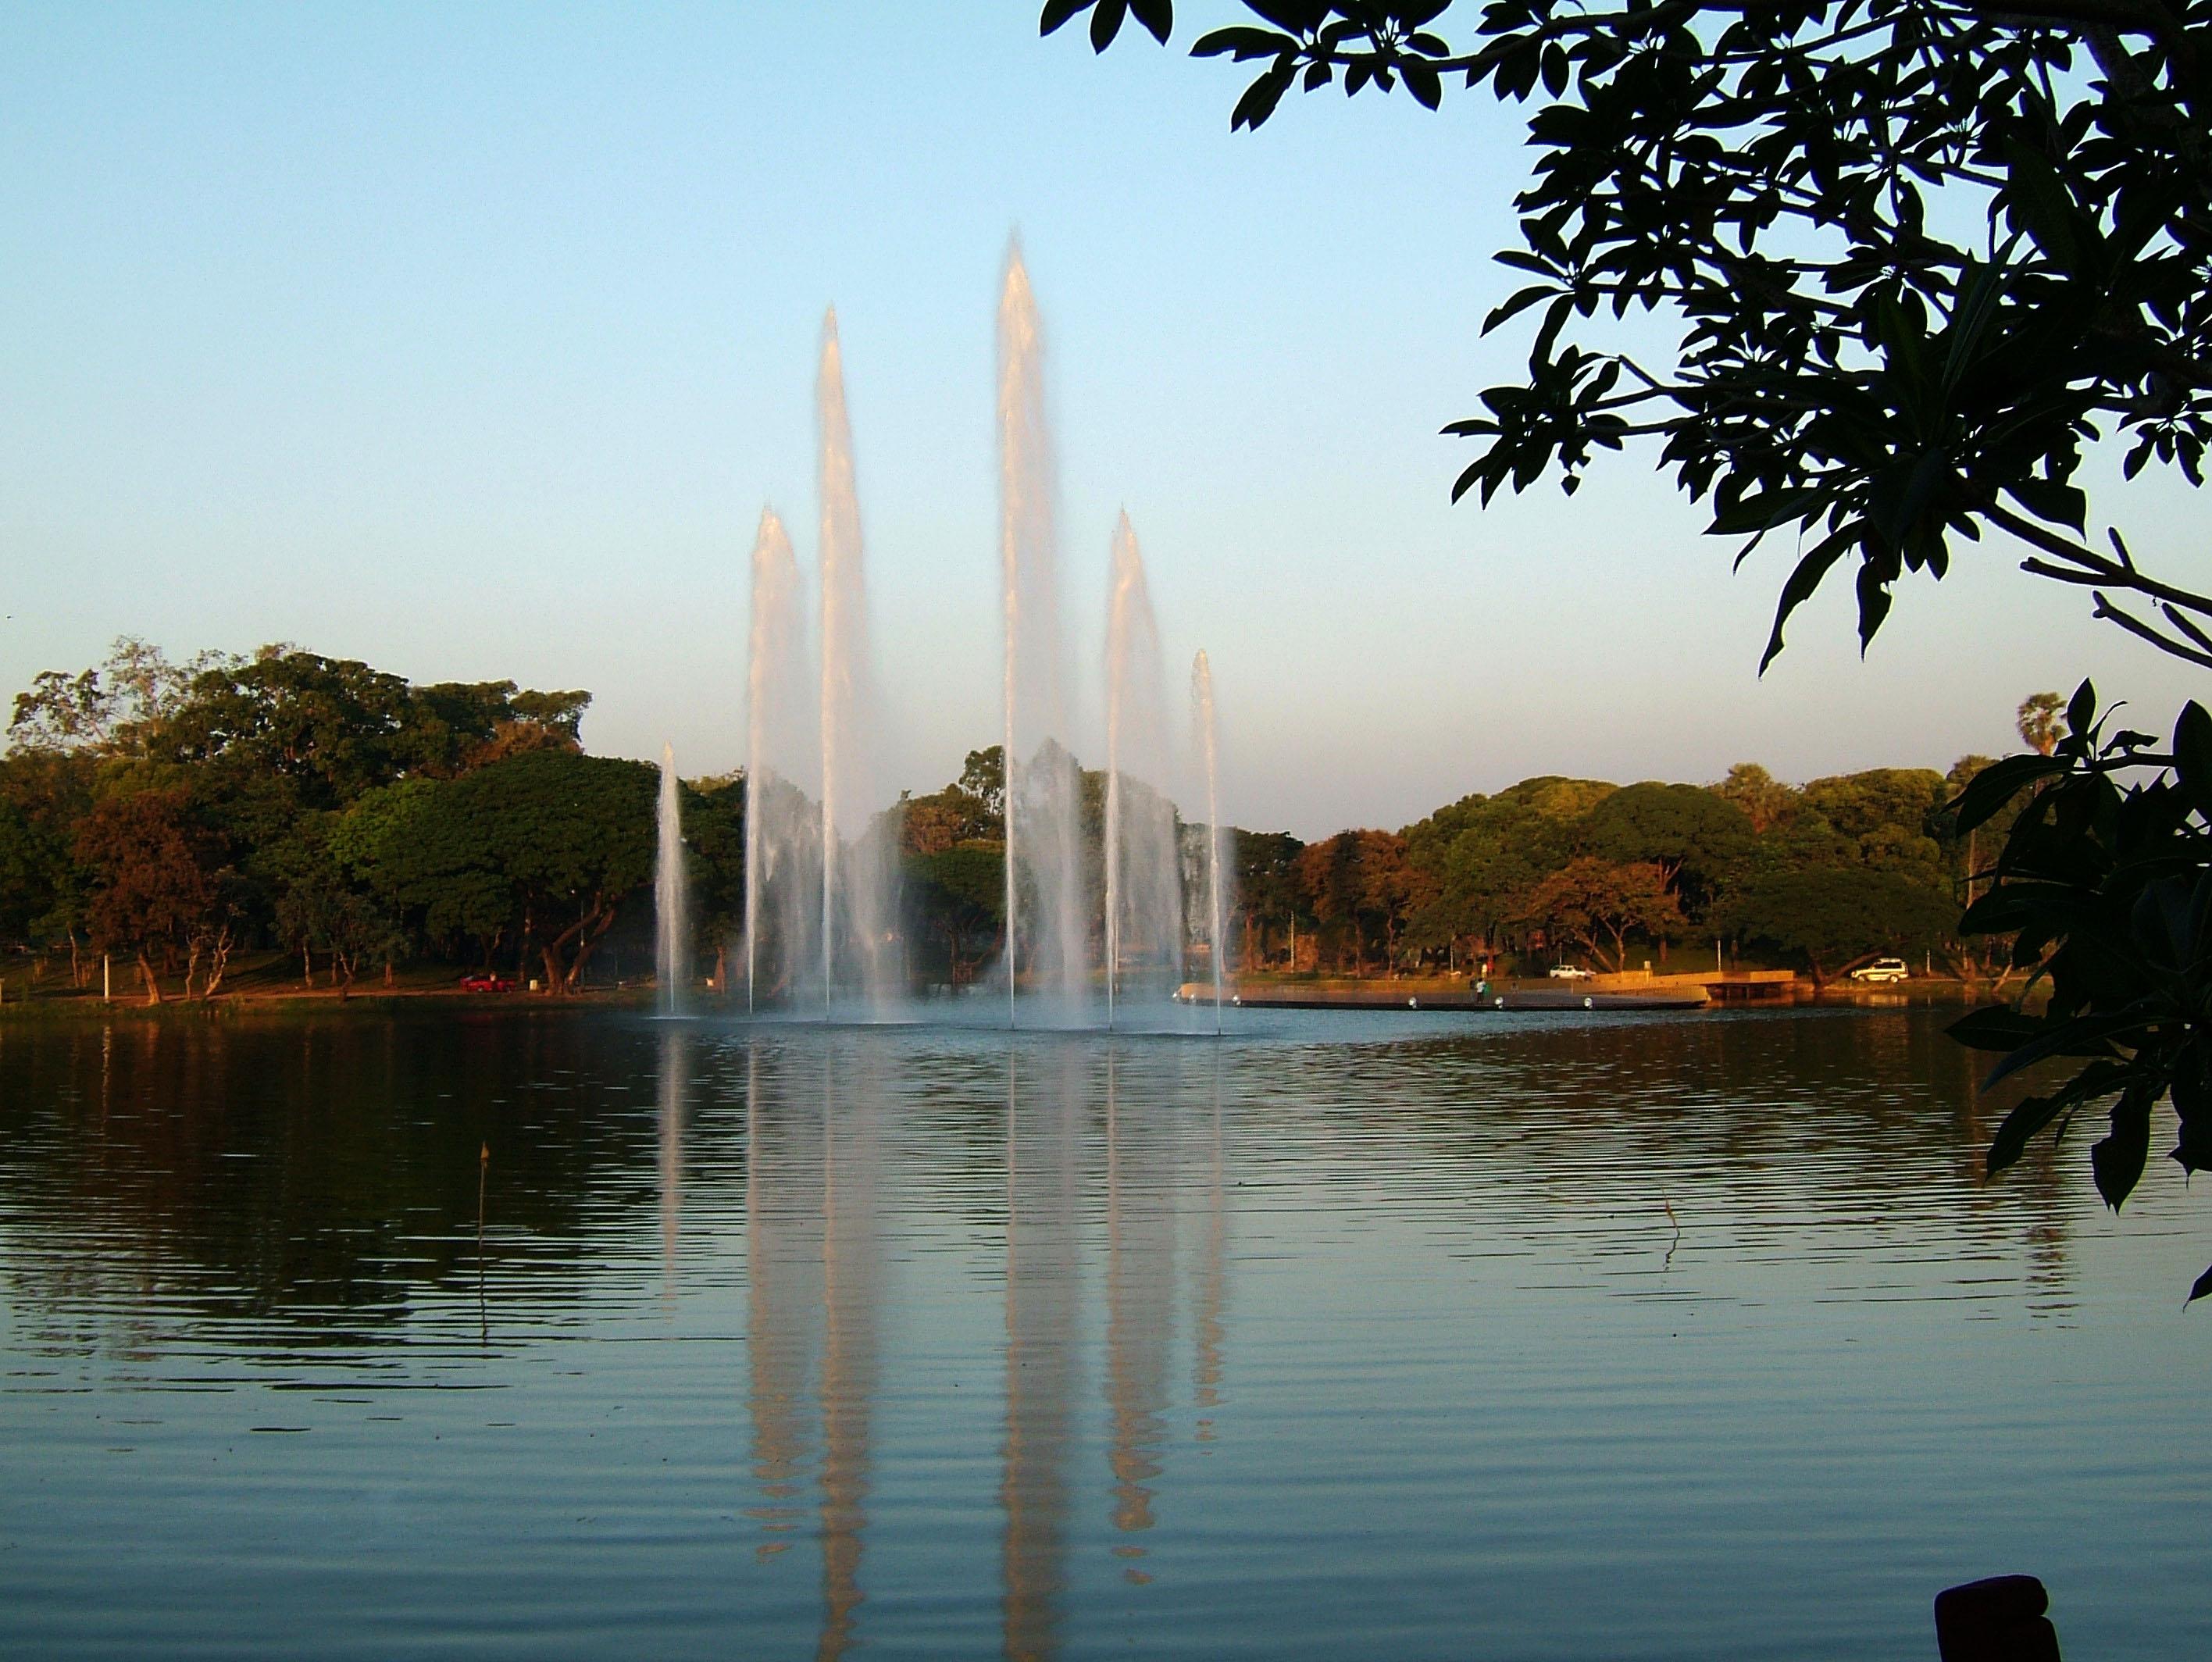 Yangon Kandawgyi Lake fountain panoramic views Nov 2004 01